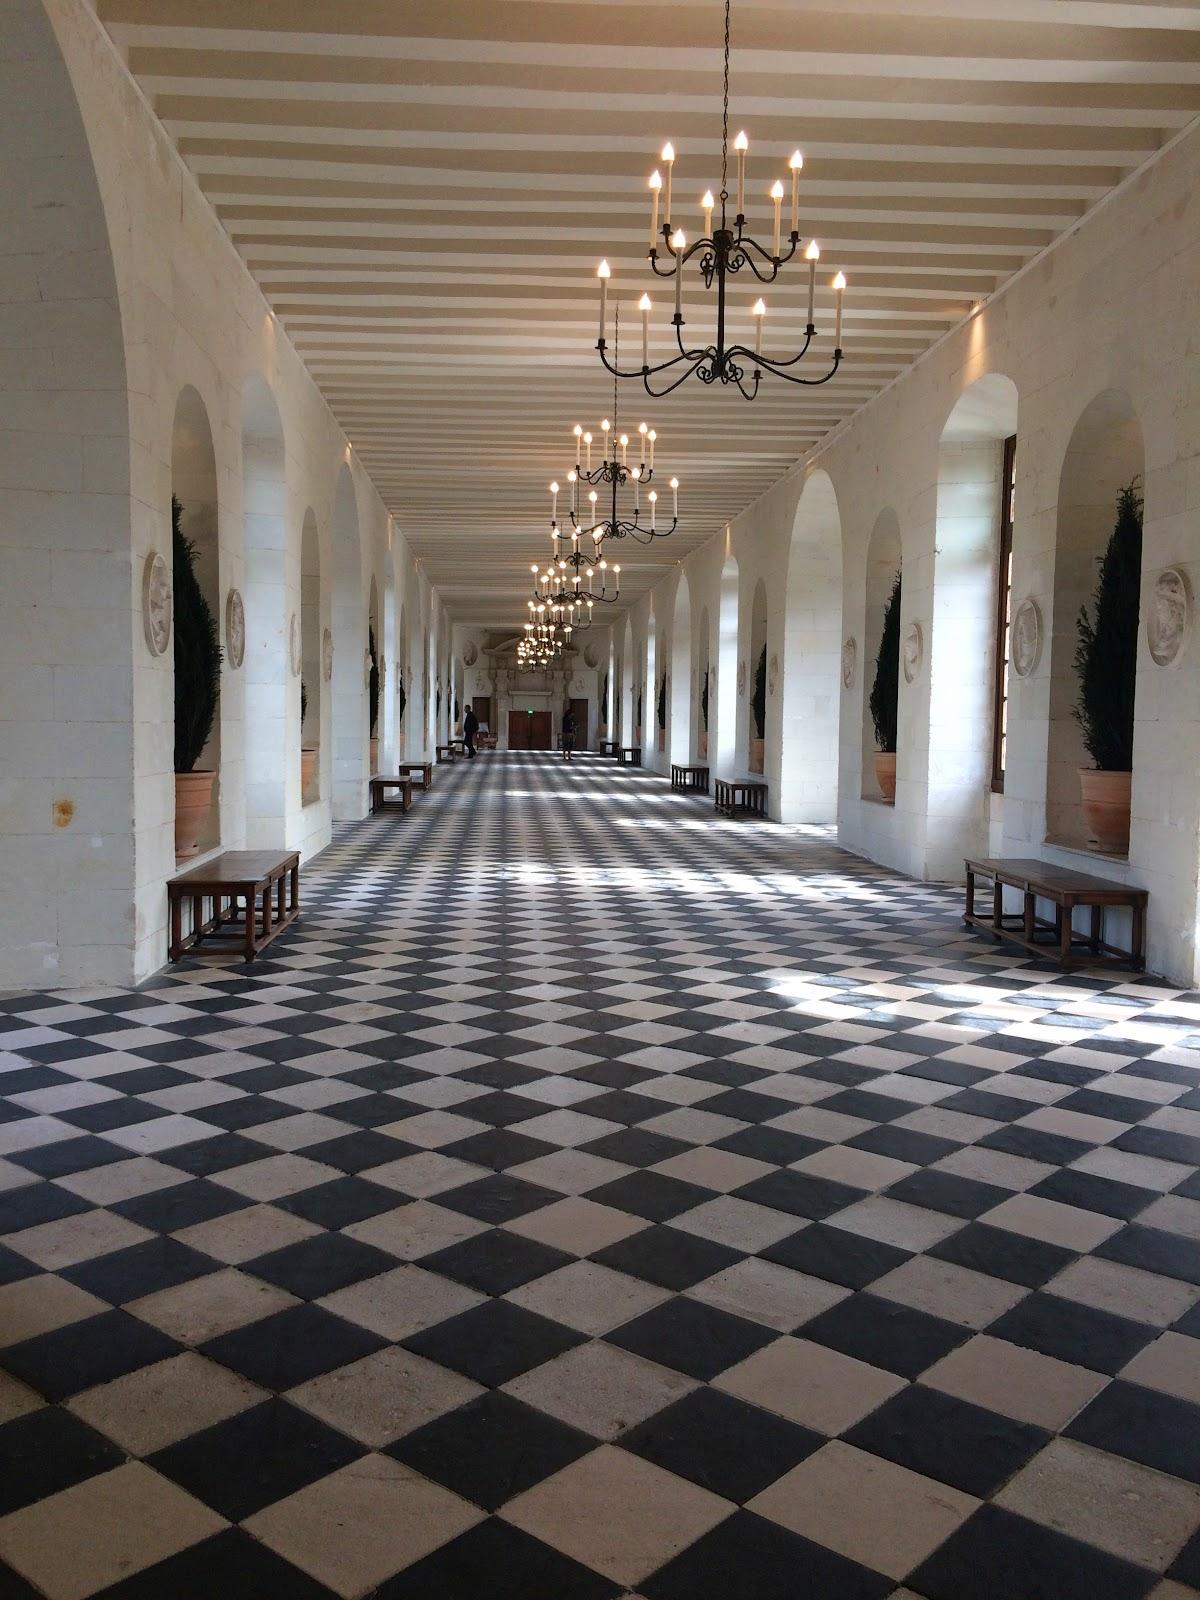 24_Chateau Chnonceau3.jpg